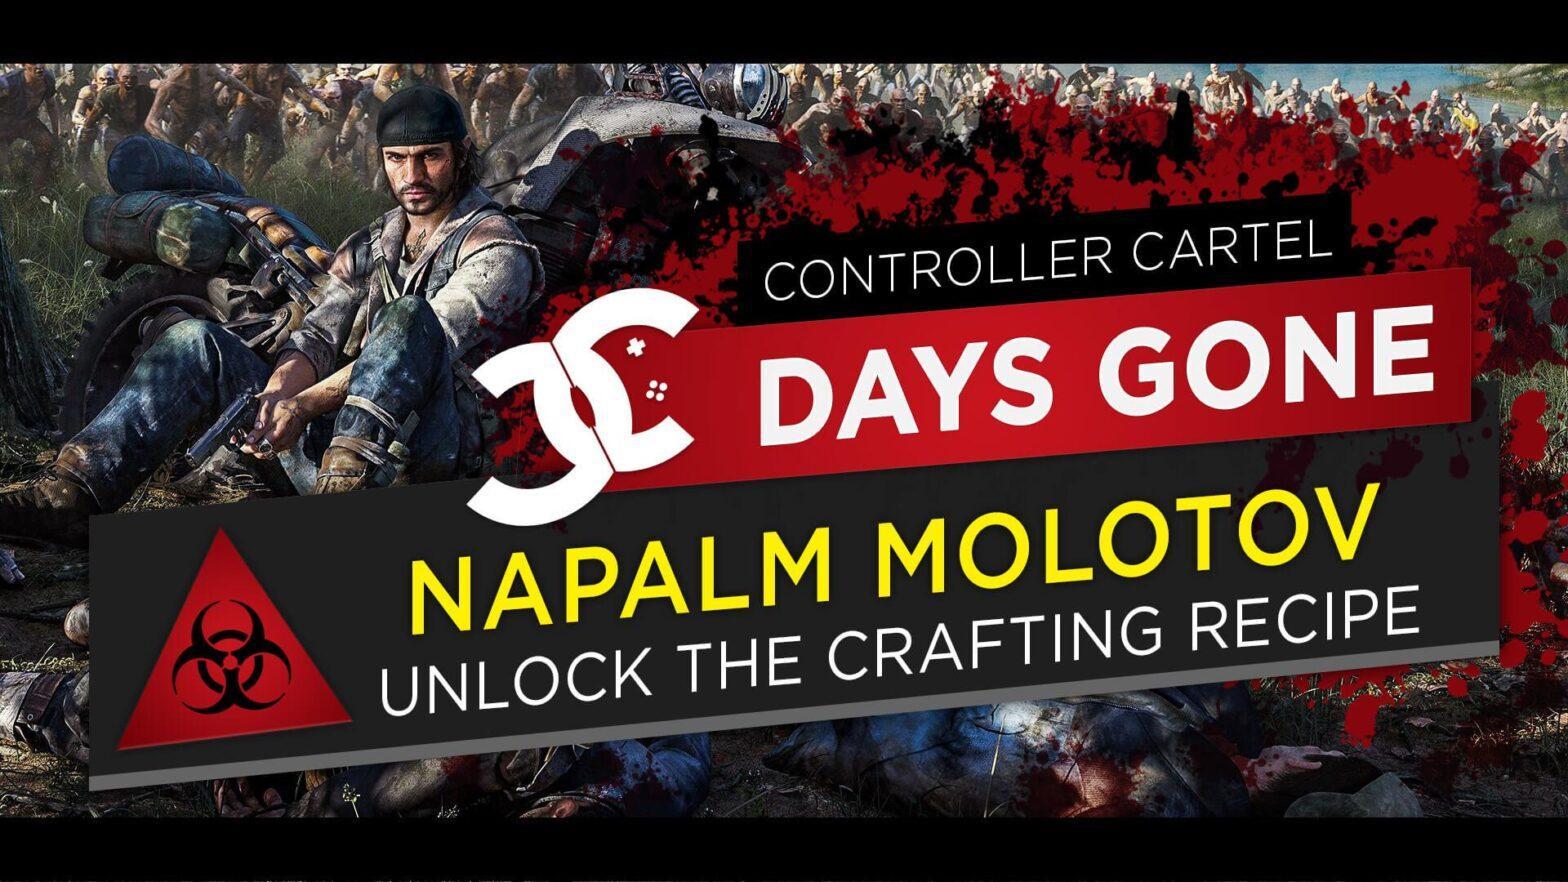 Days Gone Napalm Molotov Recipe